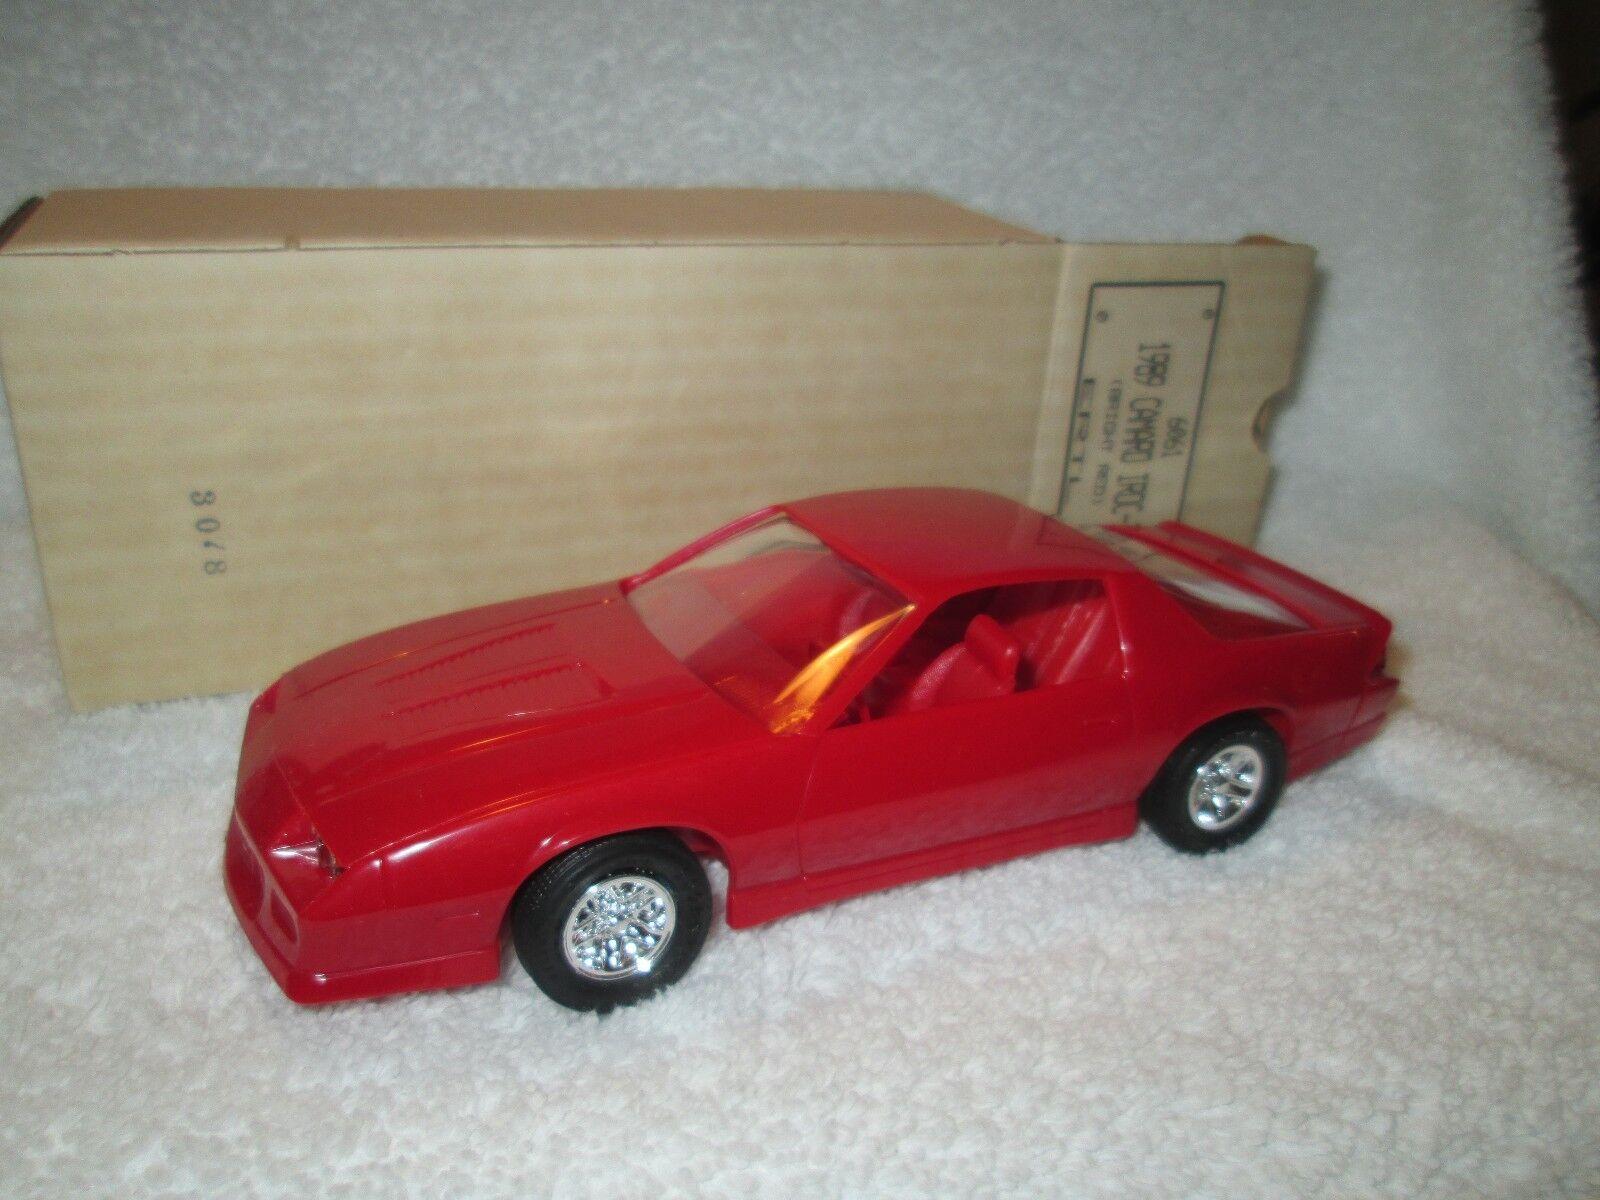 1989 Chevrolet camaro RED IROC Z 90 Dealer Promo LOOSE DISPLAY PIECE